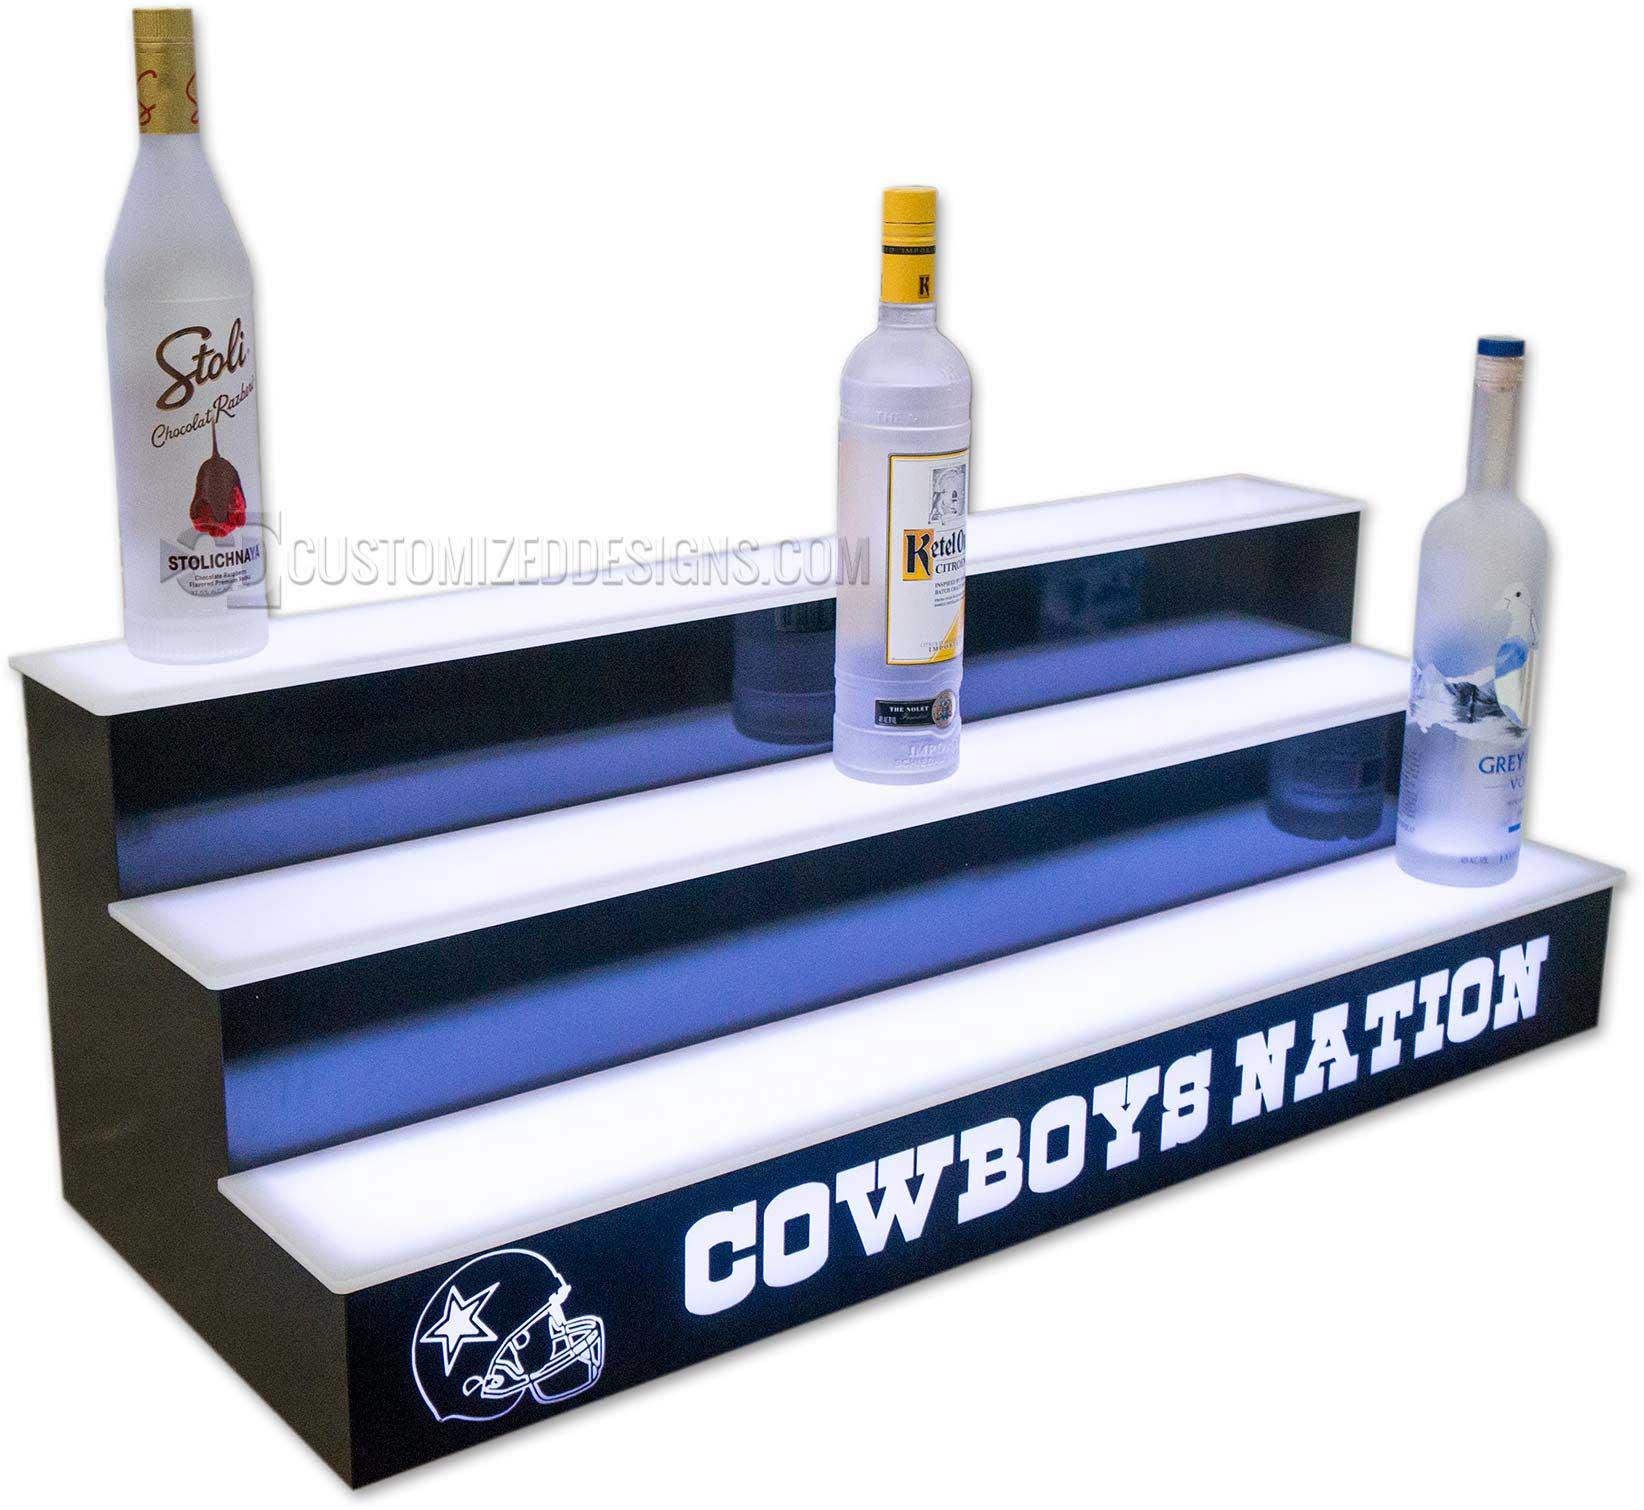 Another Dallas Cowboys Home Bar Display